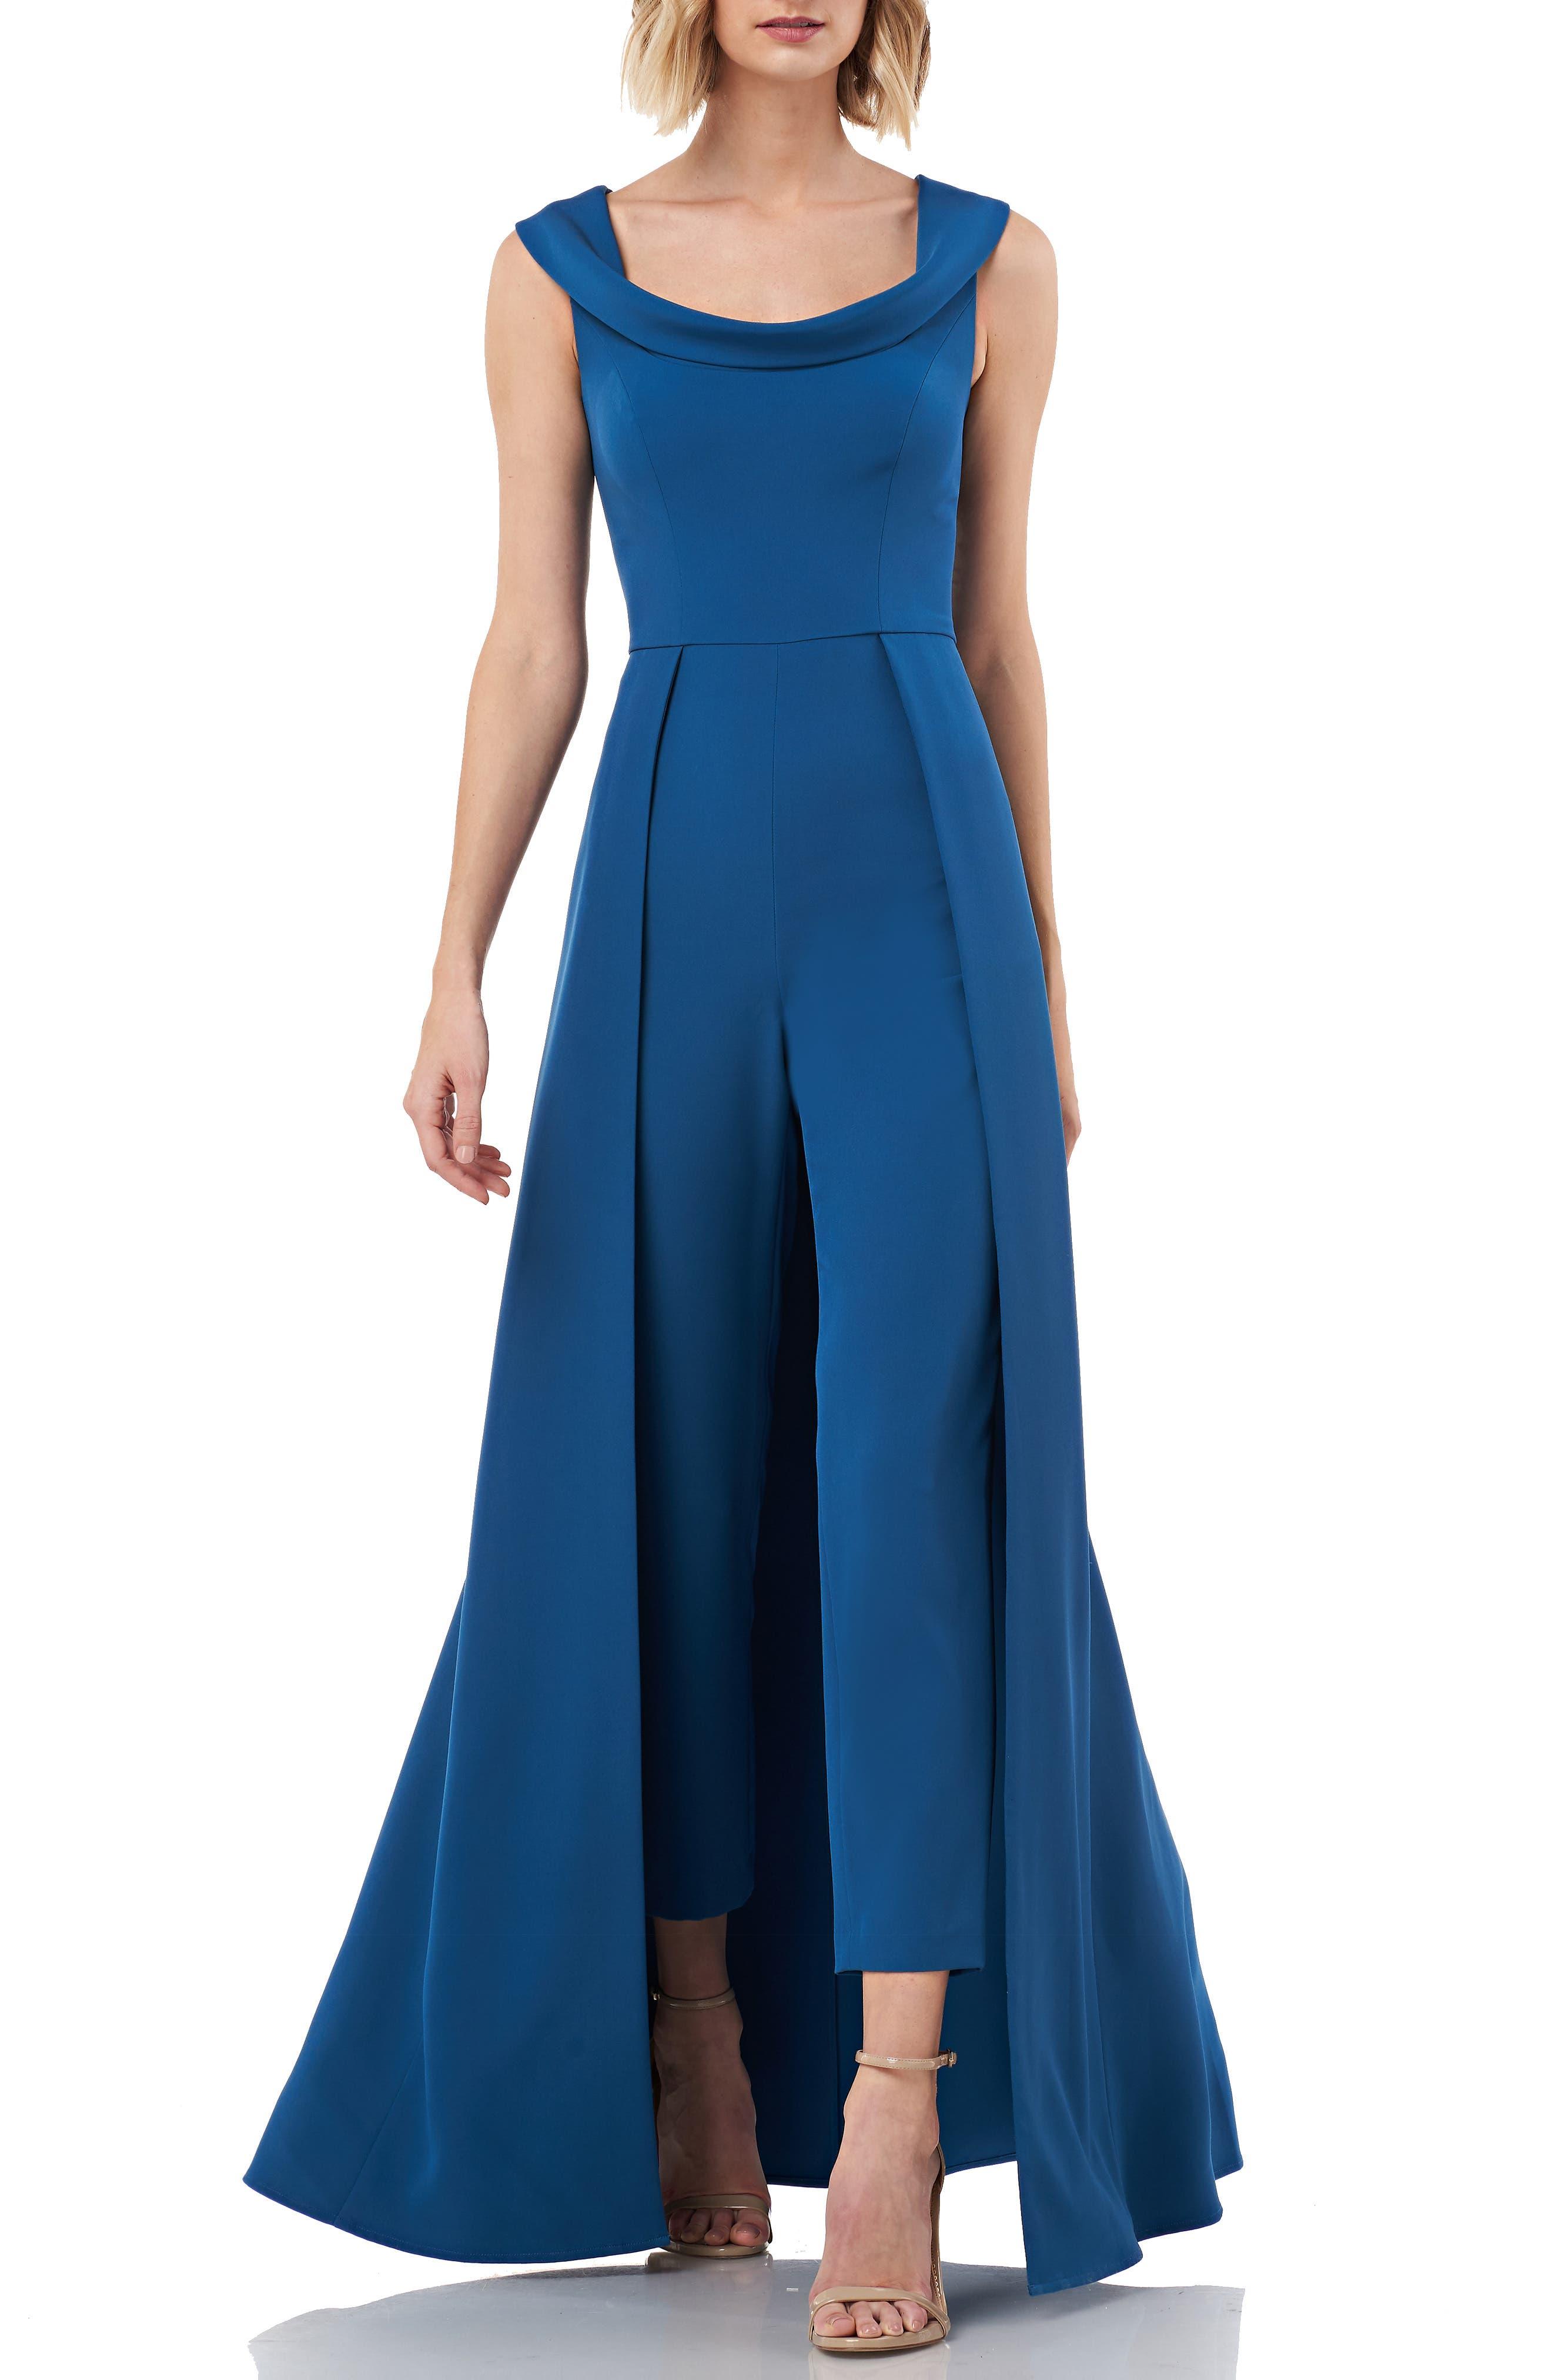 1950s Hostess Gown Pant Set- I Love Lucy Dress Womens Kay Unger Jumpsuit Gown Size 10 - Bluegreen $268.00 AT vintagedancer.com